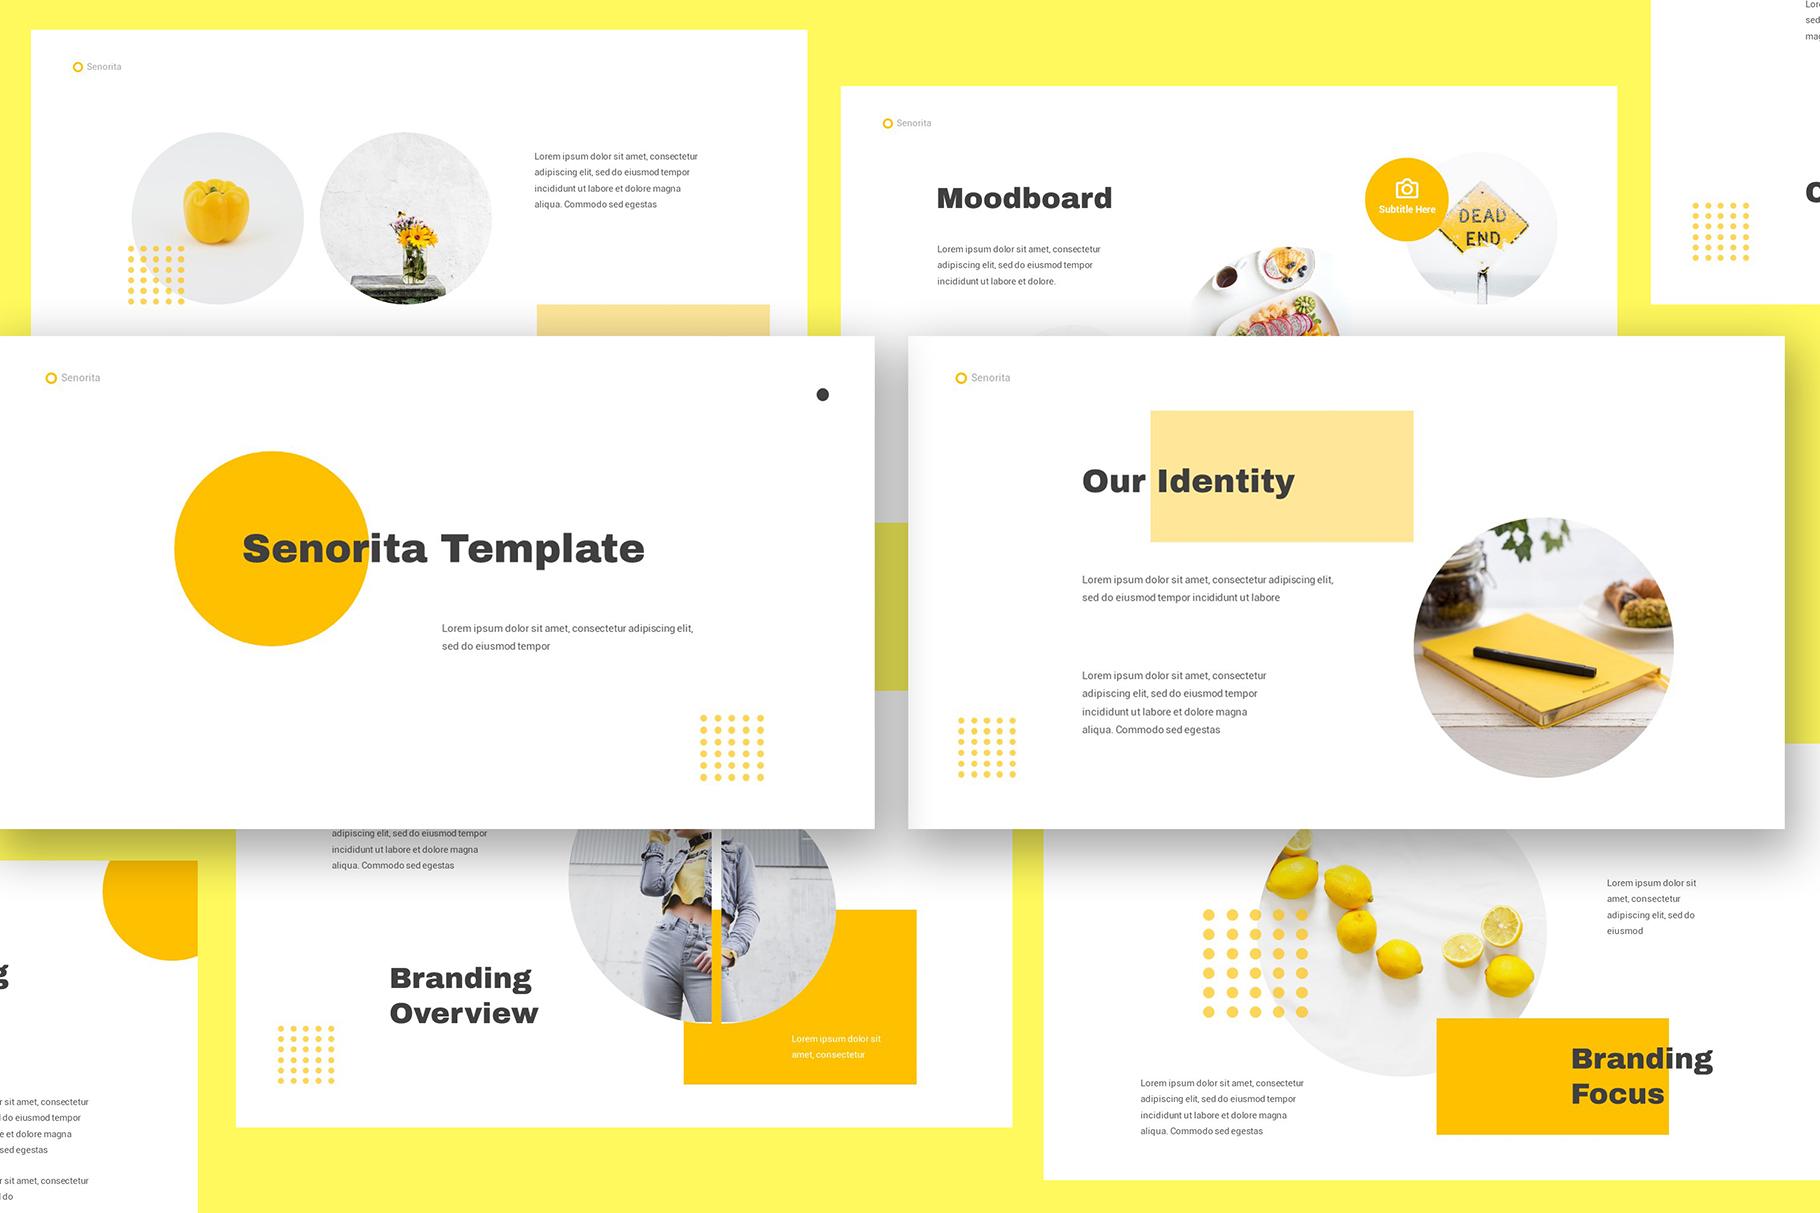 Senorita Brand Guideline Keynote example image 1